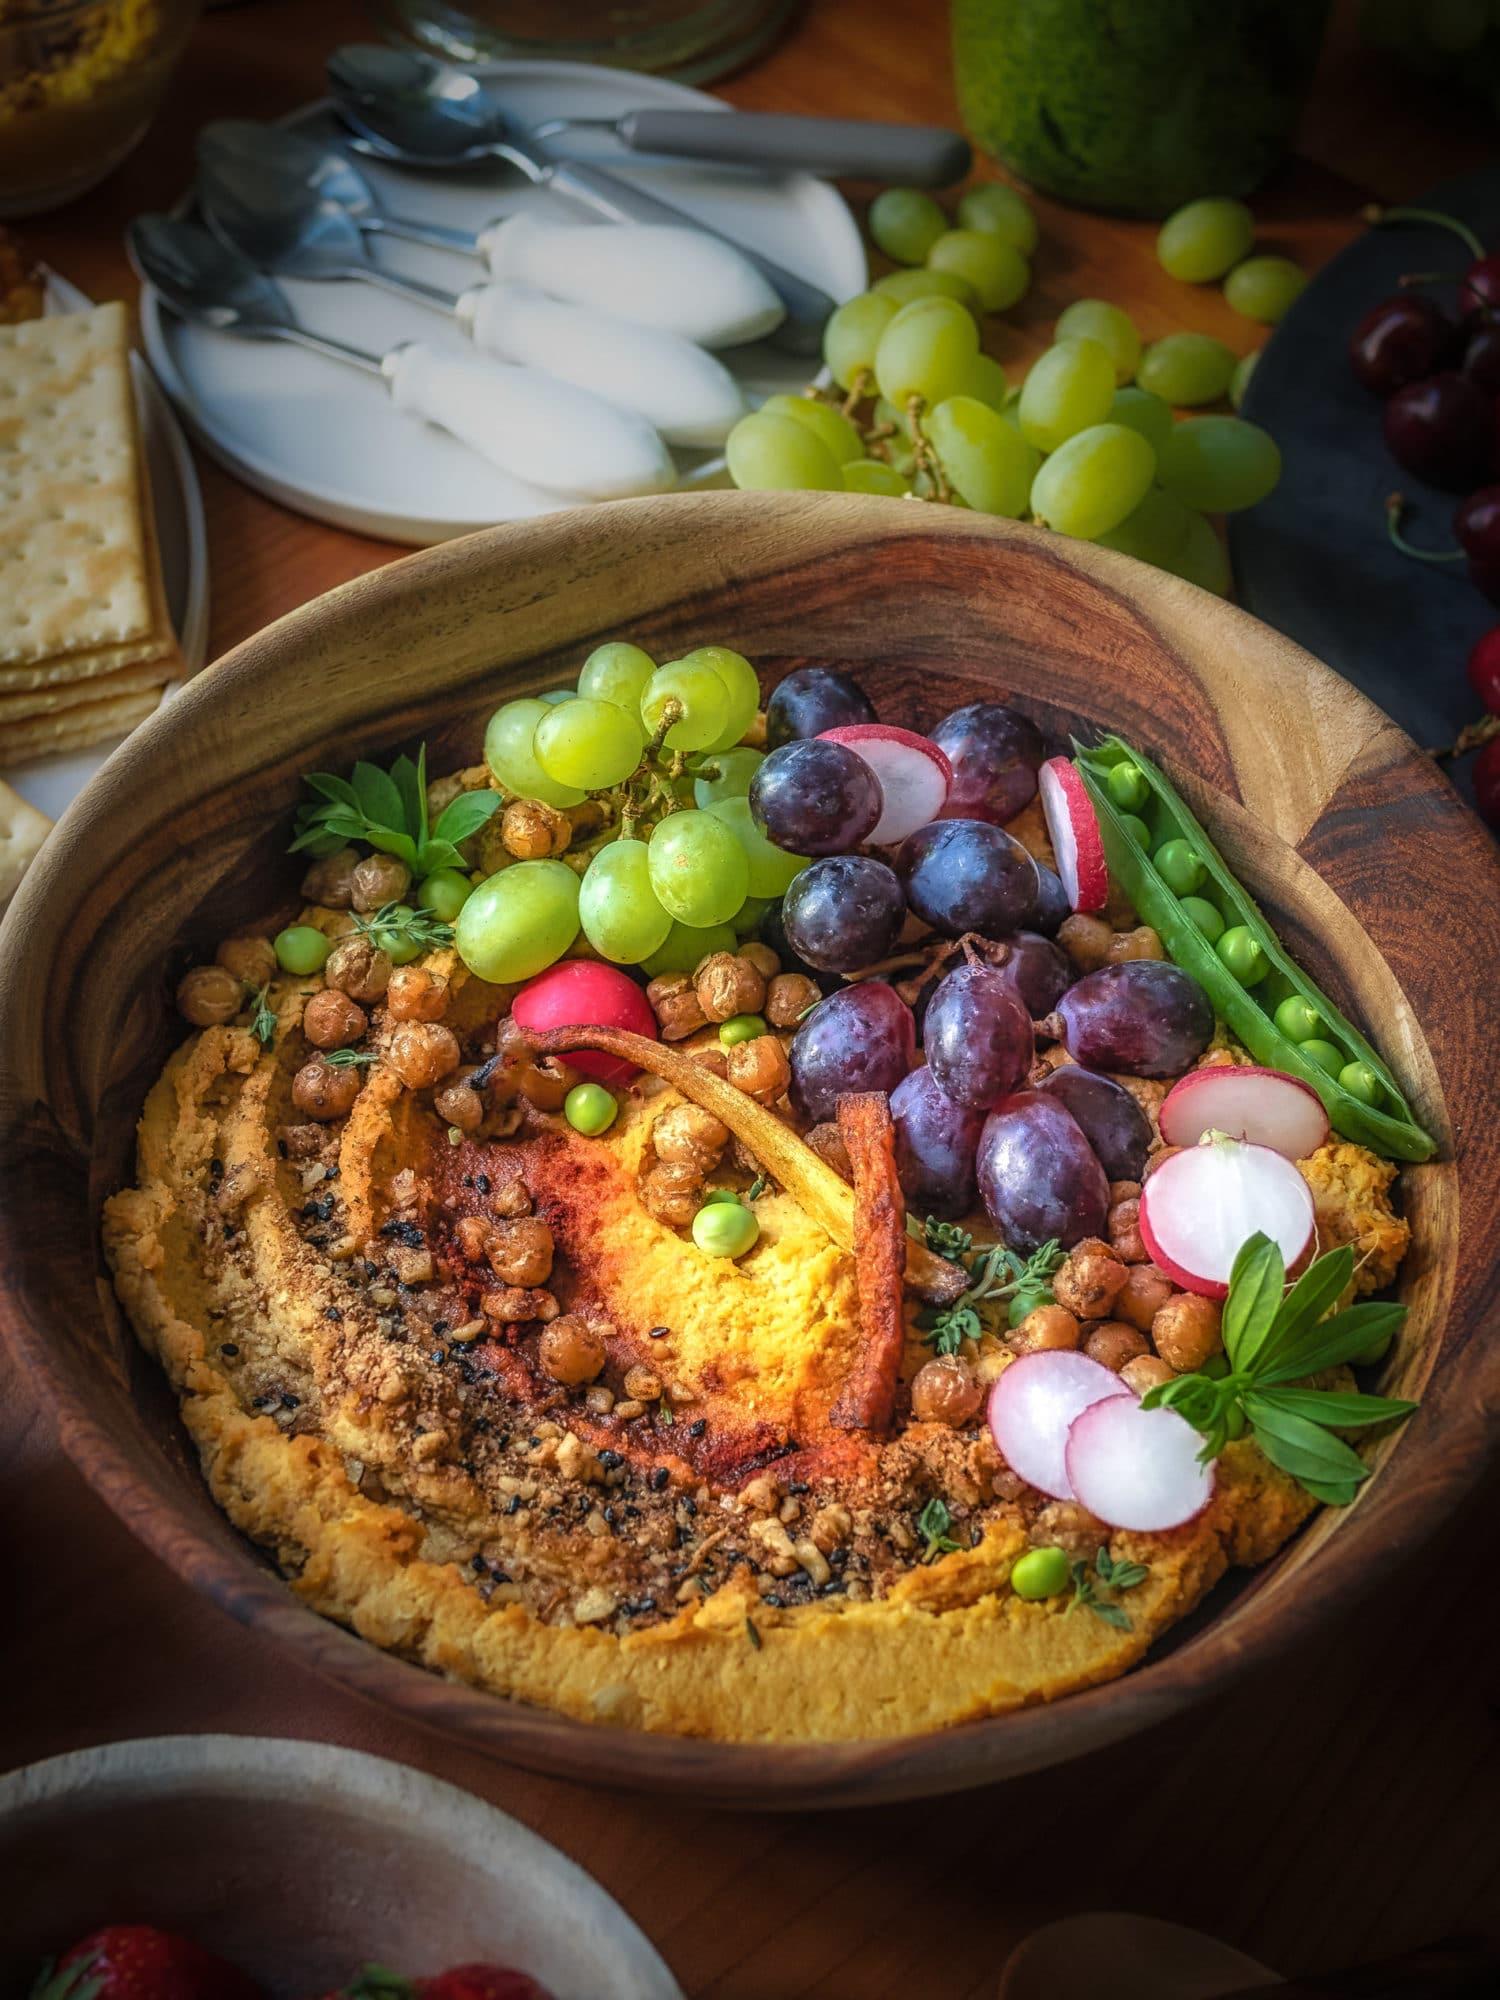 Kürbis Rezept : Kürbis Hummus bunt garniert.